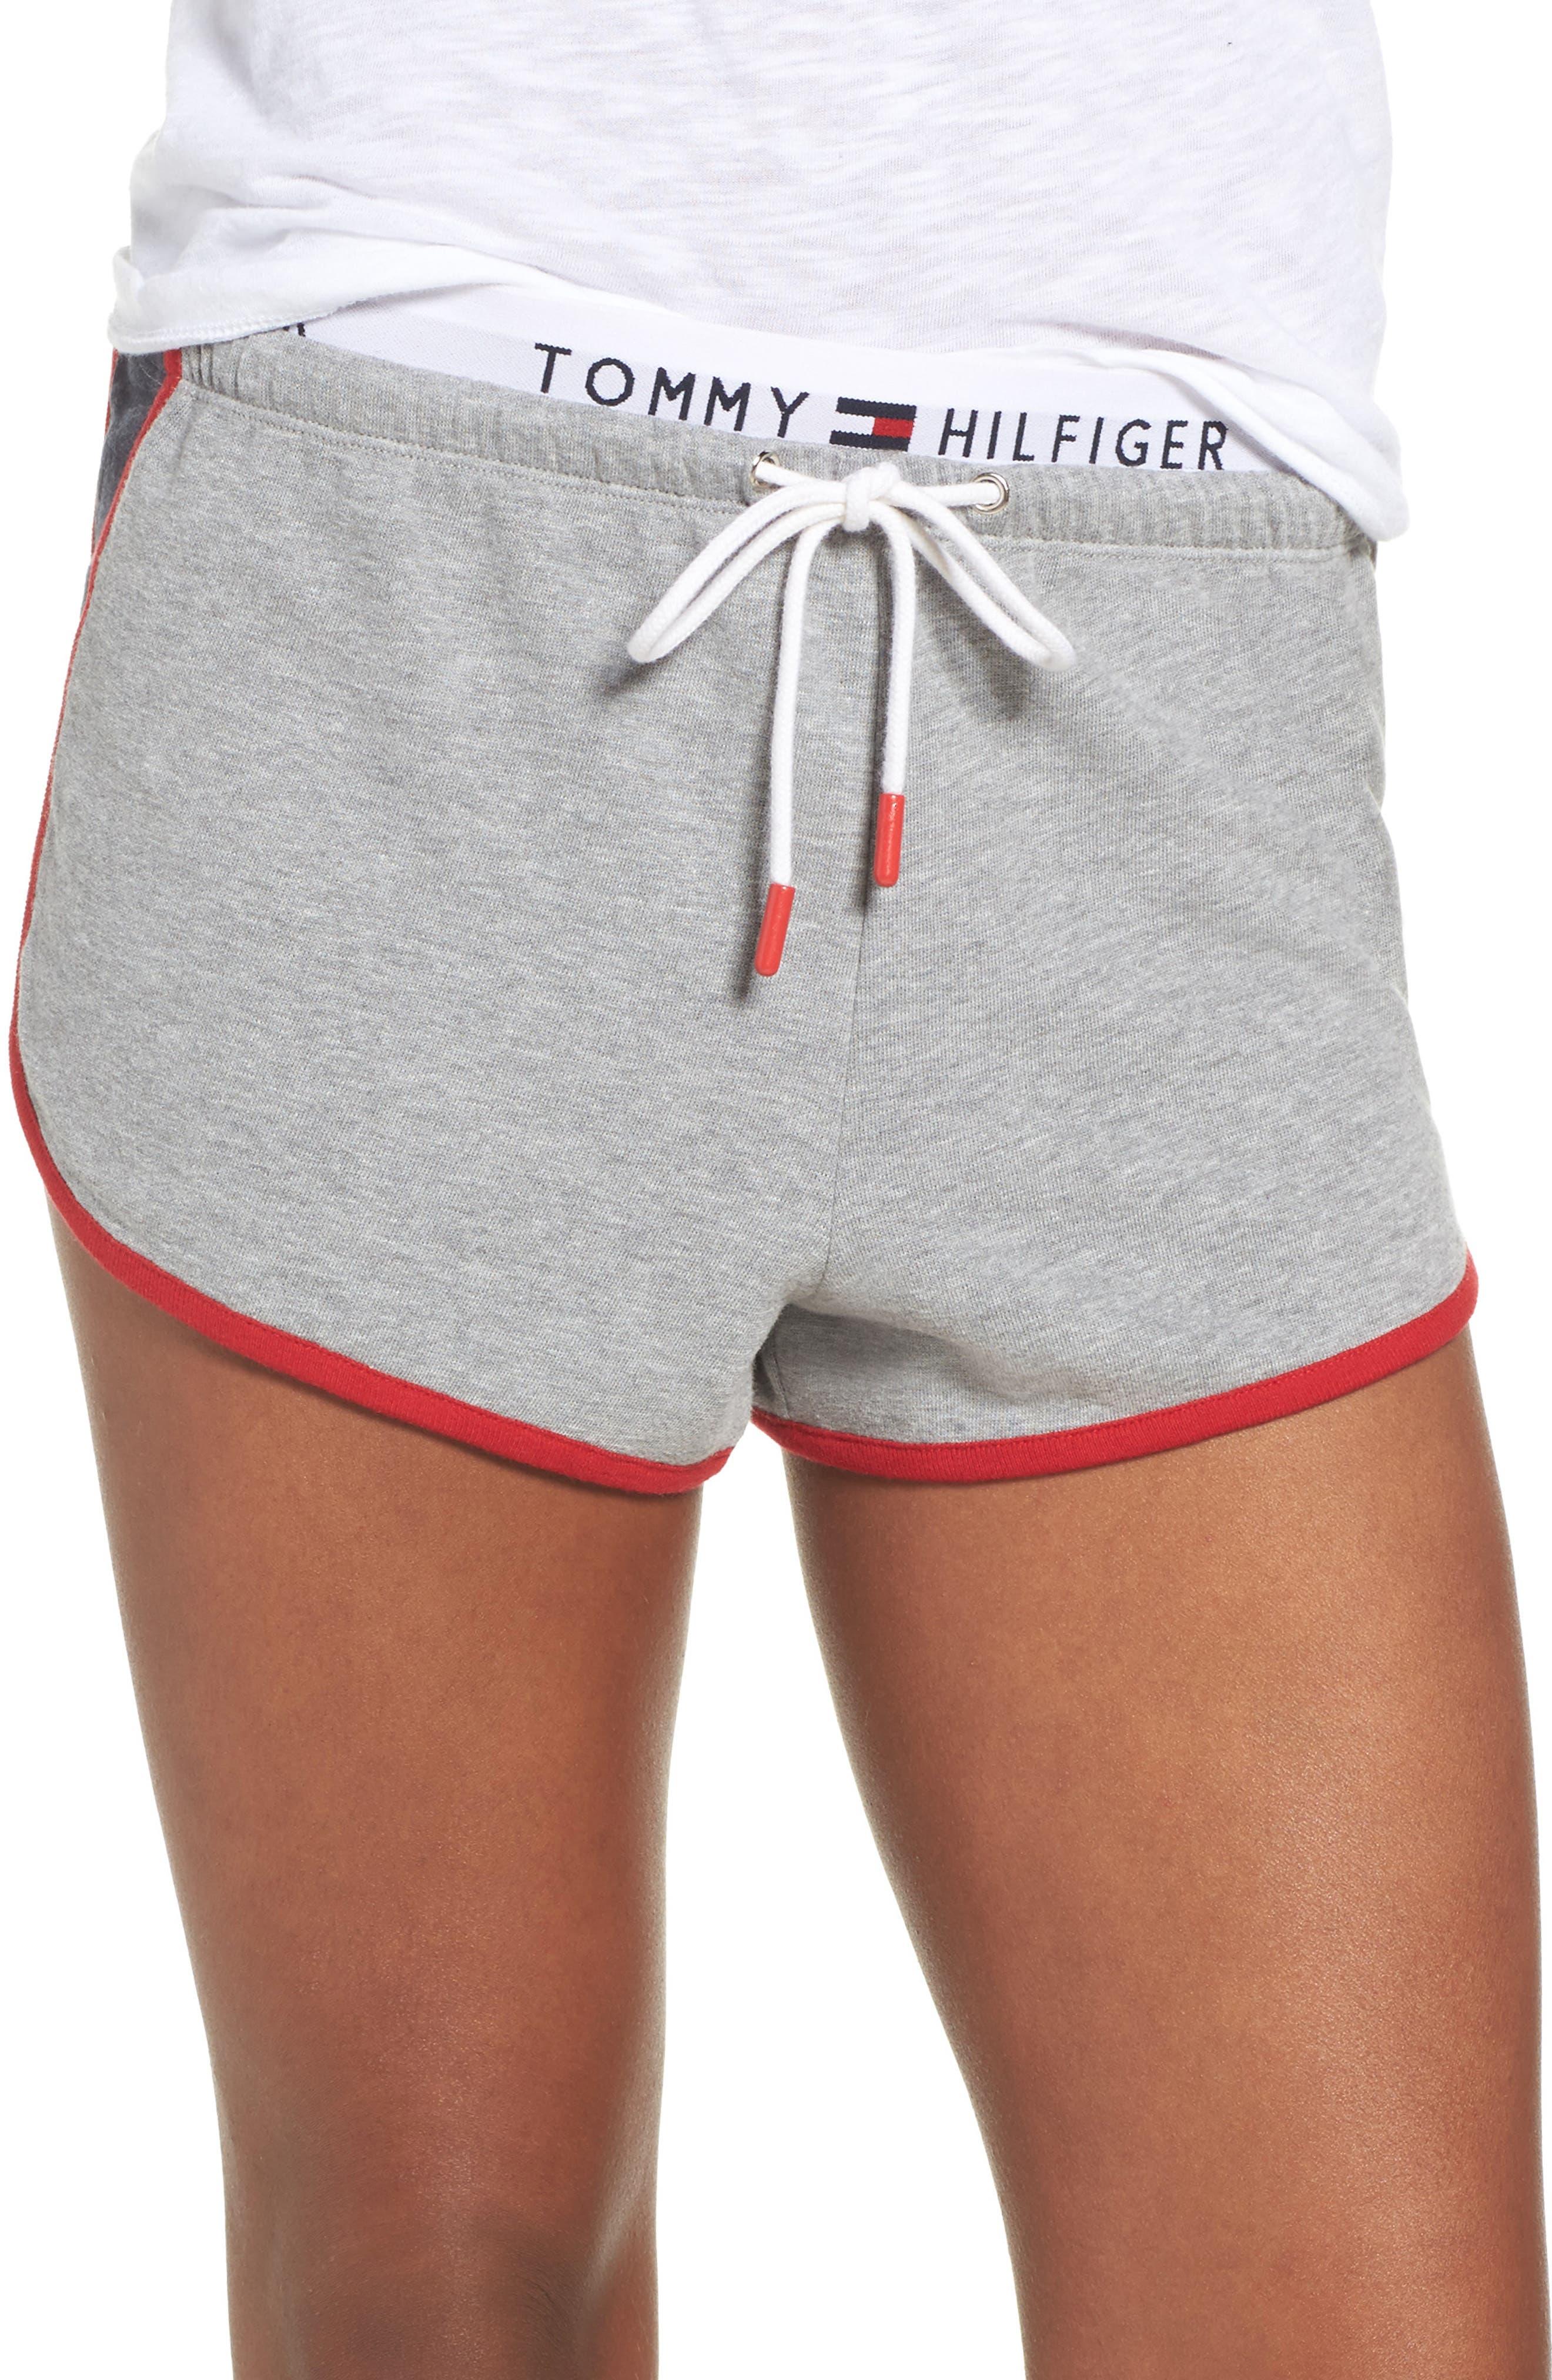 TH Retro Shorts,                         Main,                         color, 020